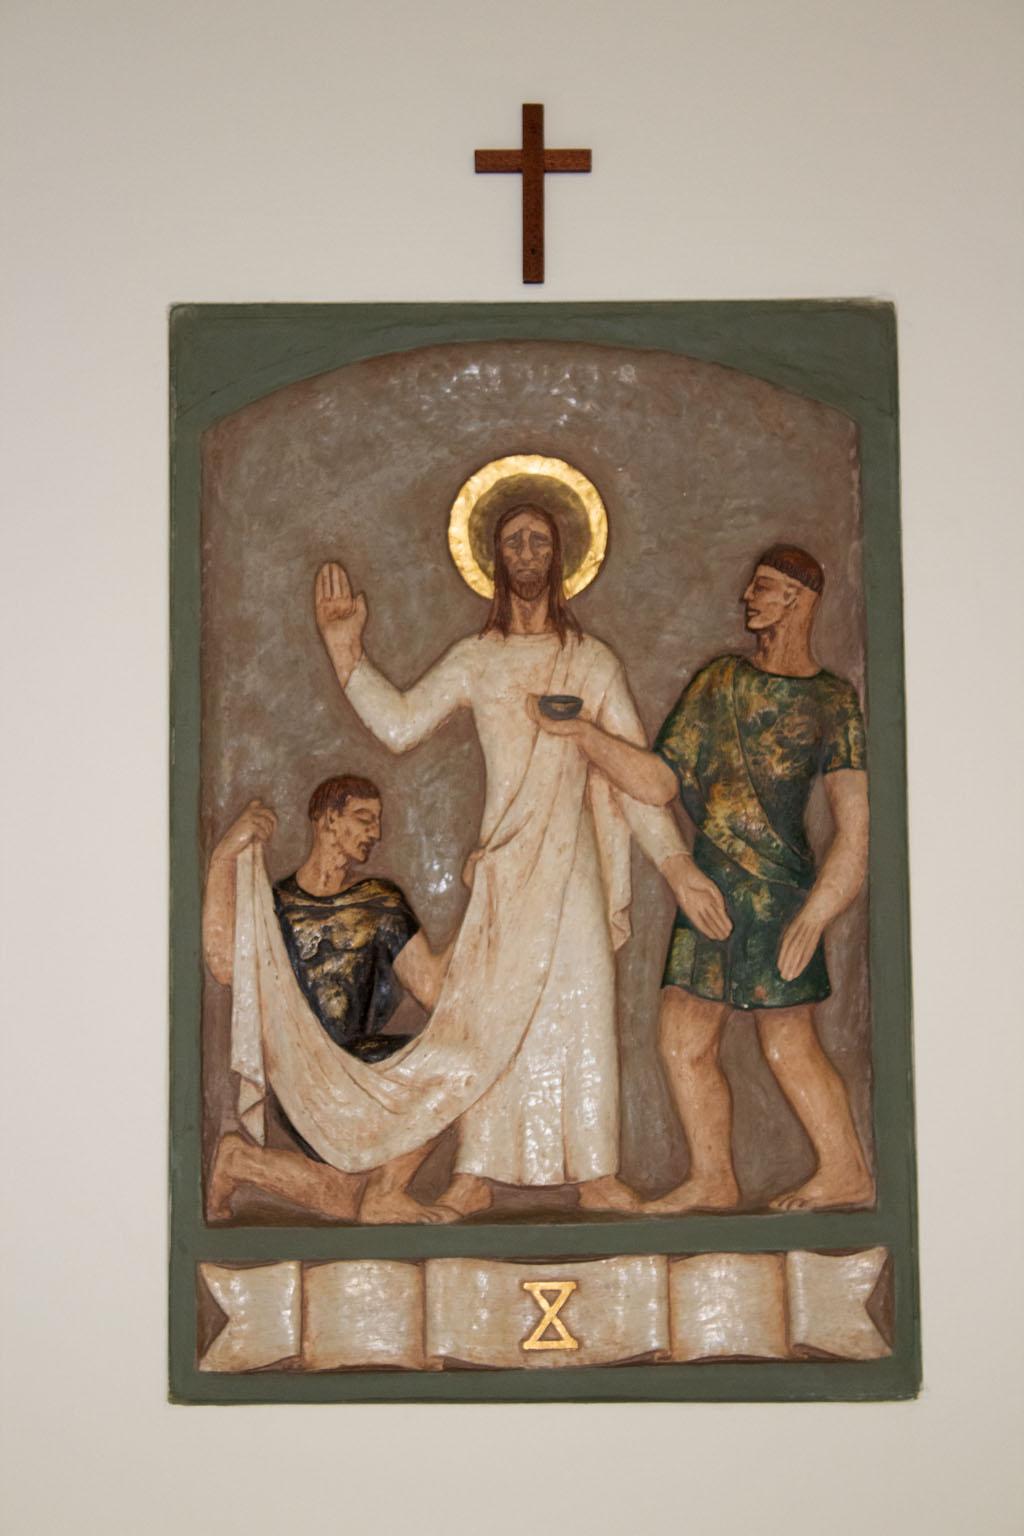 Tenth Station of the cross by Dora de Pédery Hunt